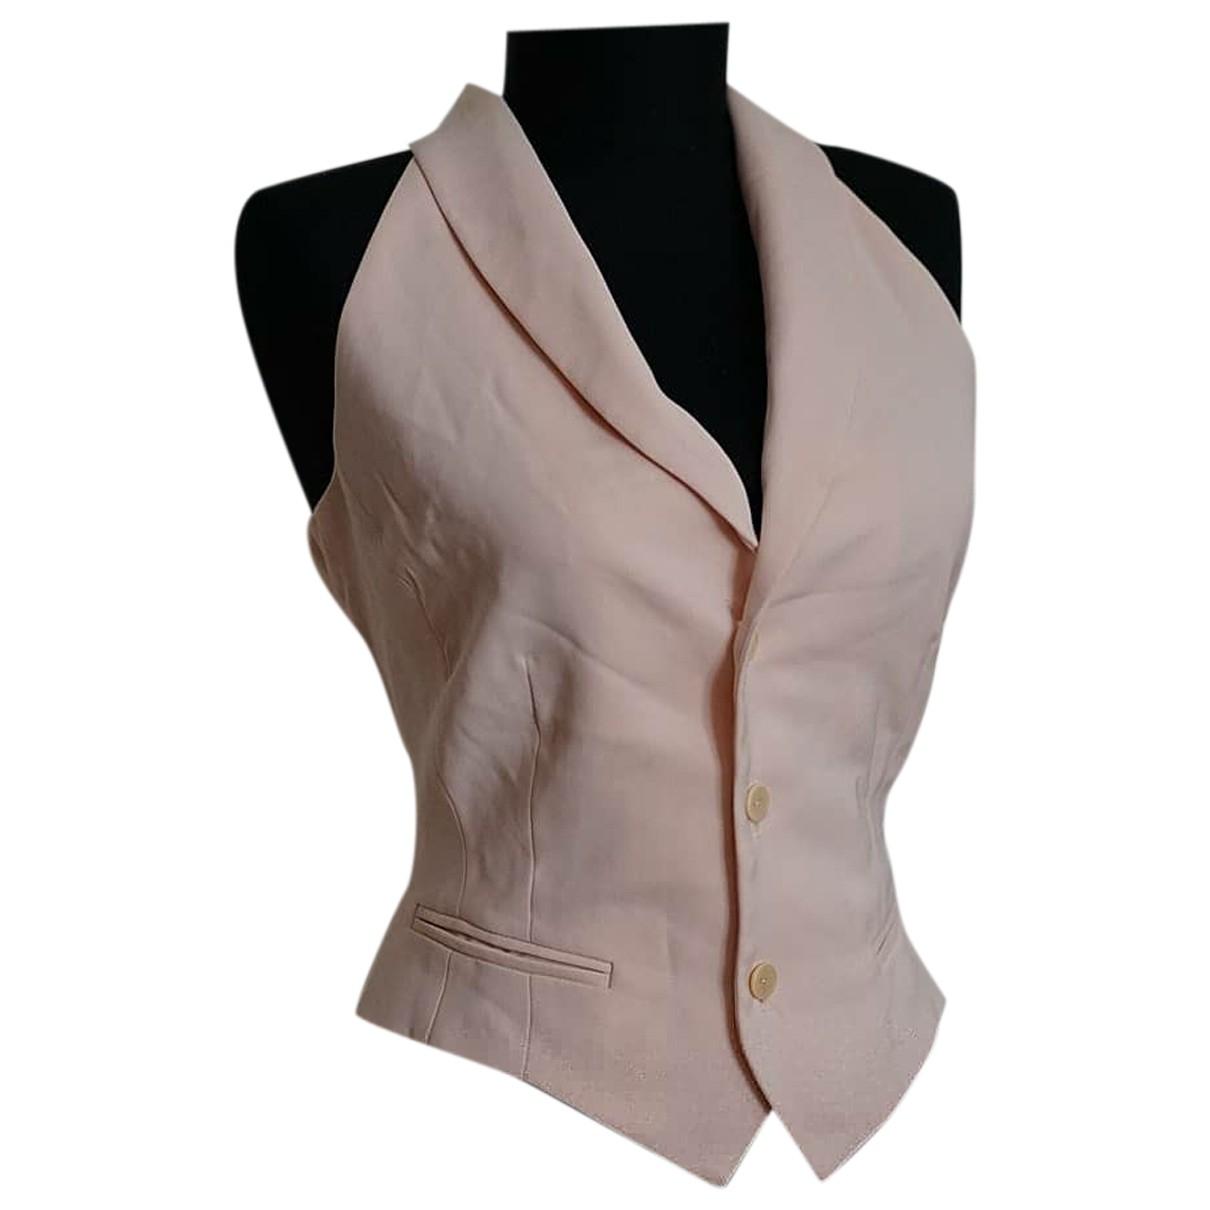 Zara \N Pink  top for Women M International